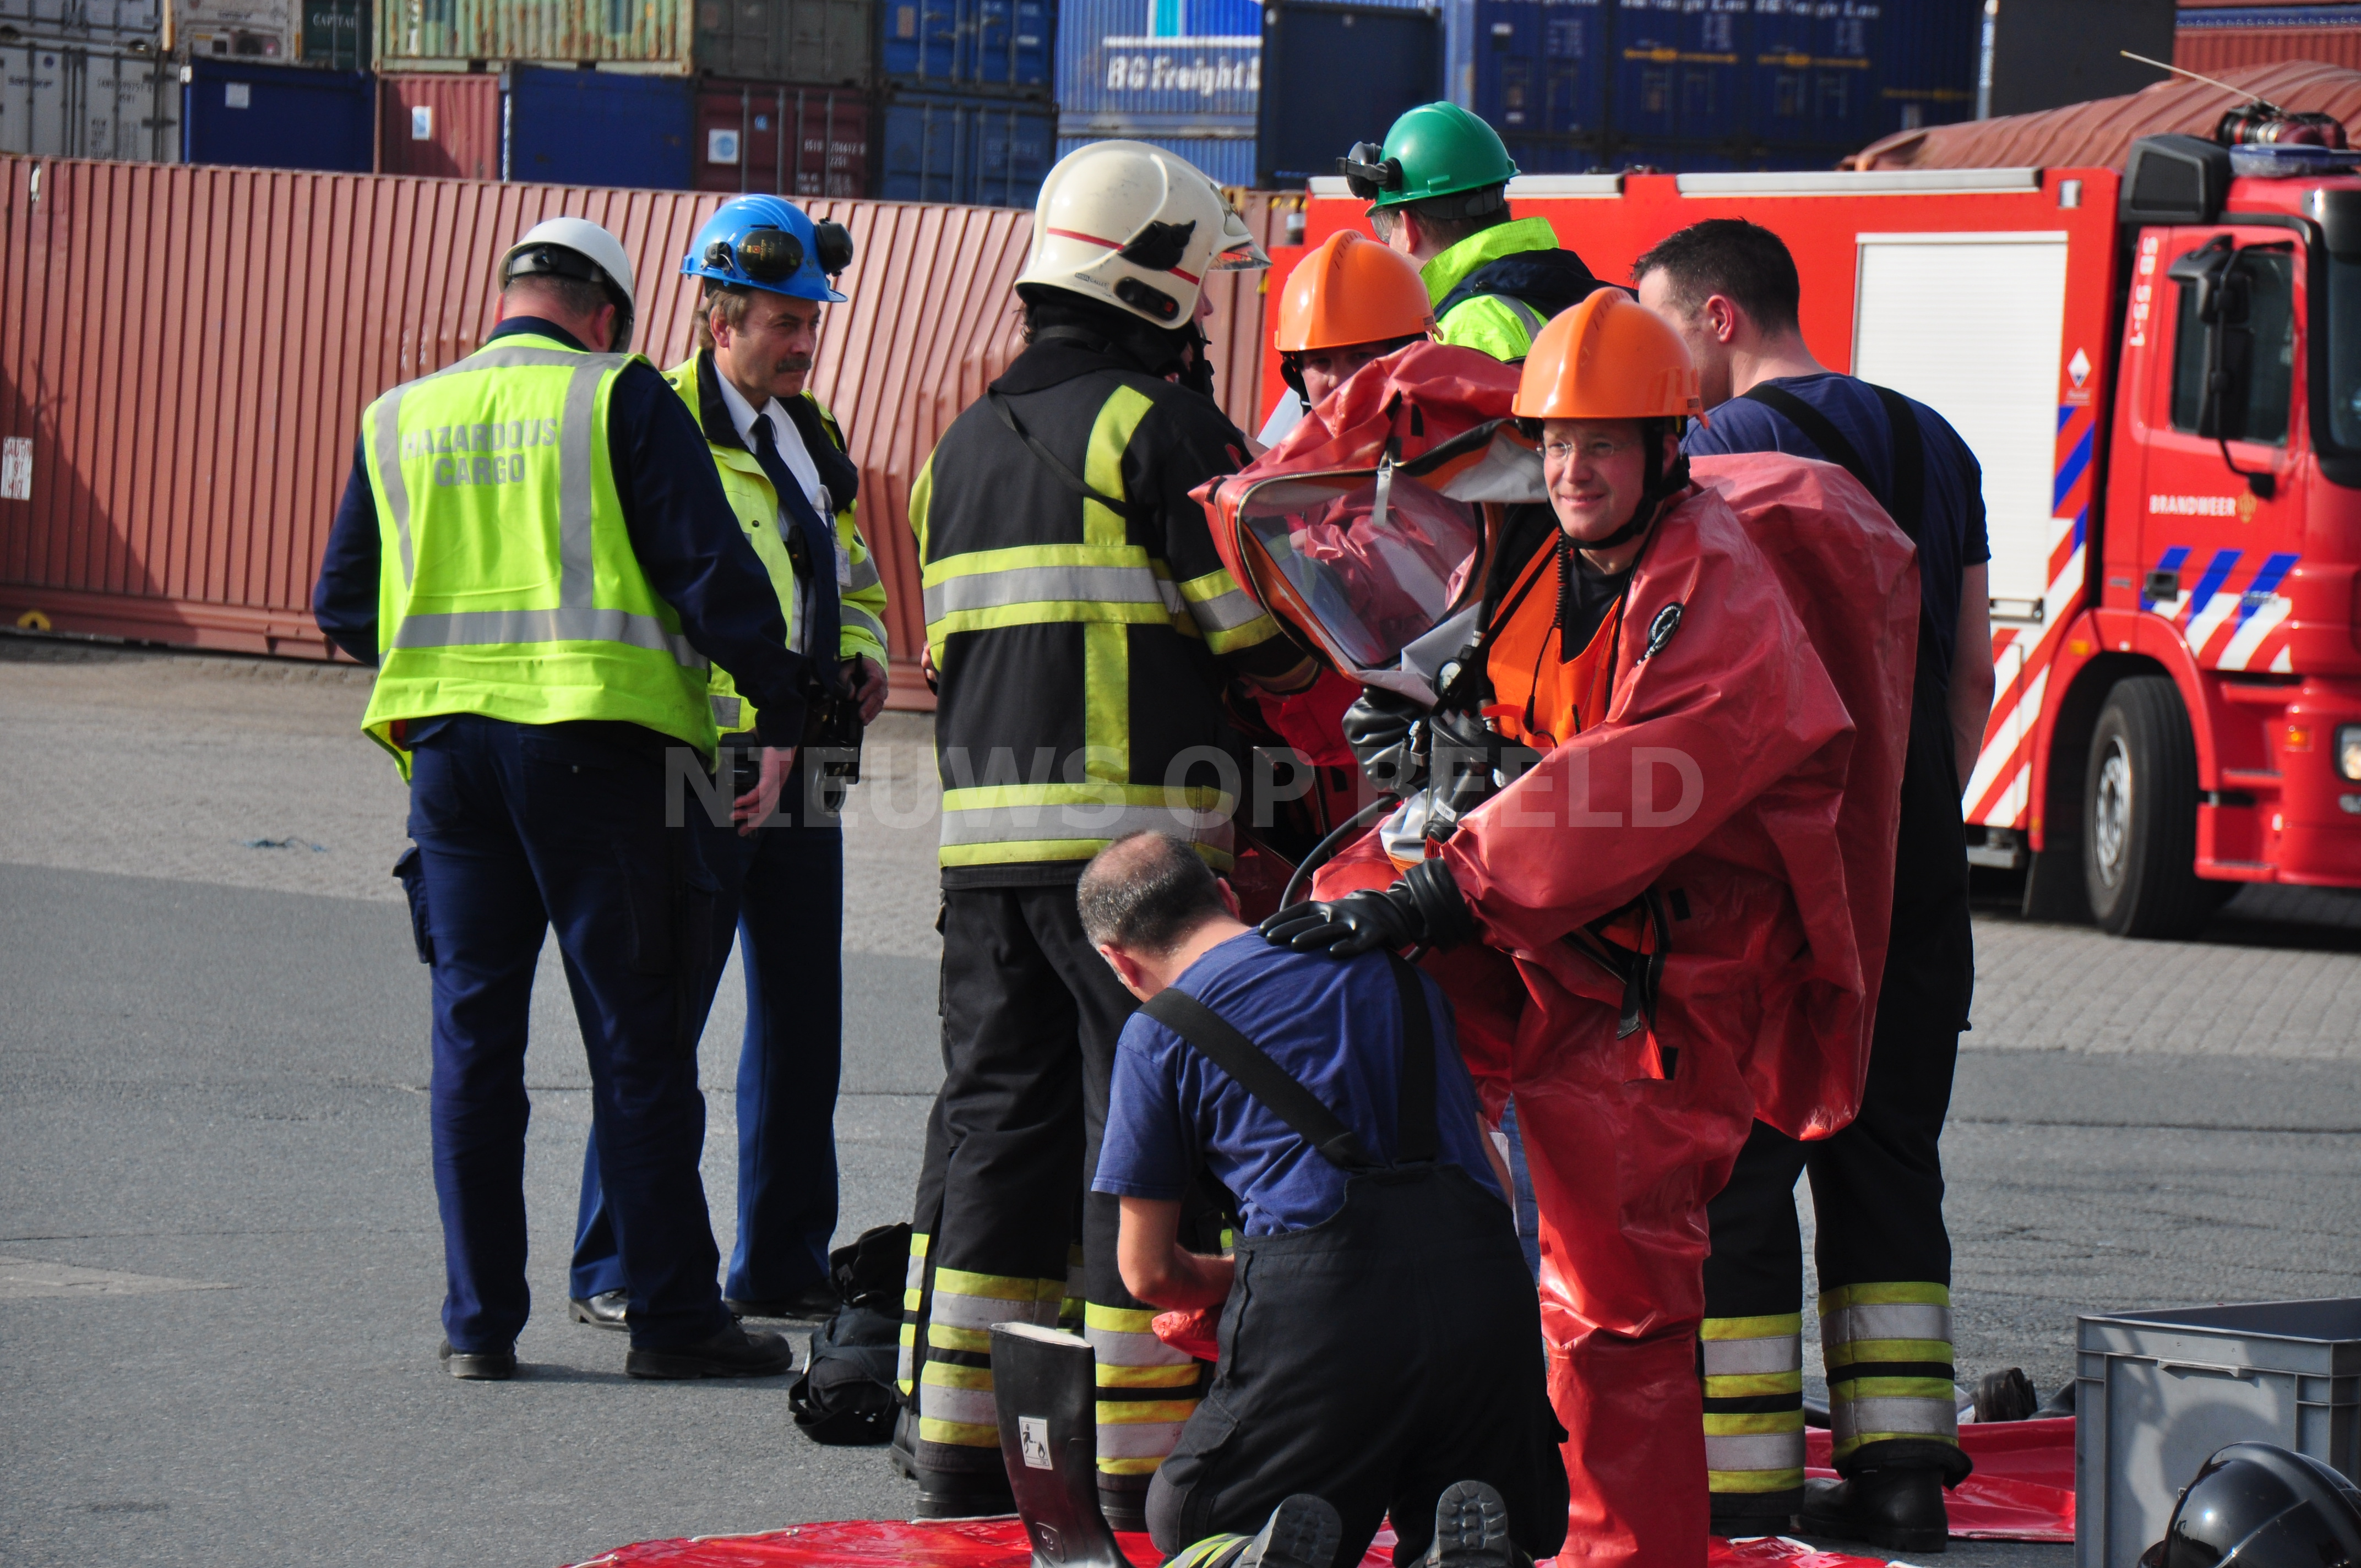 Lekkage van salpeterzuur uit container ETC Reeweg Rotterdam